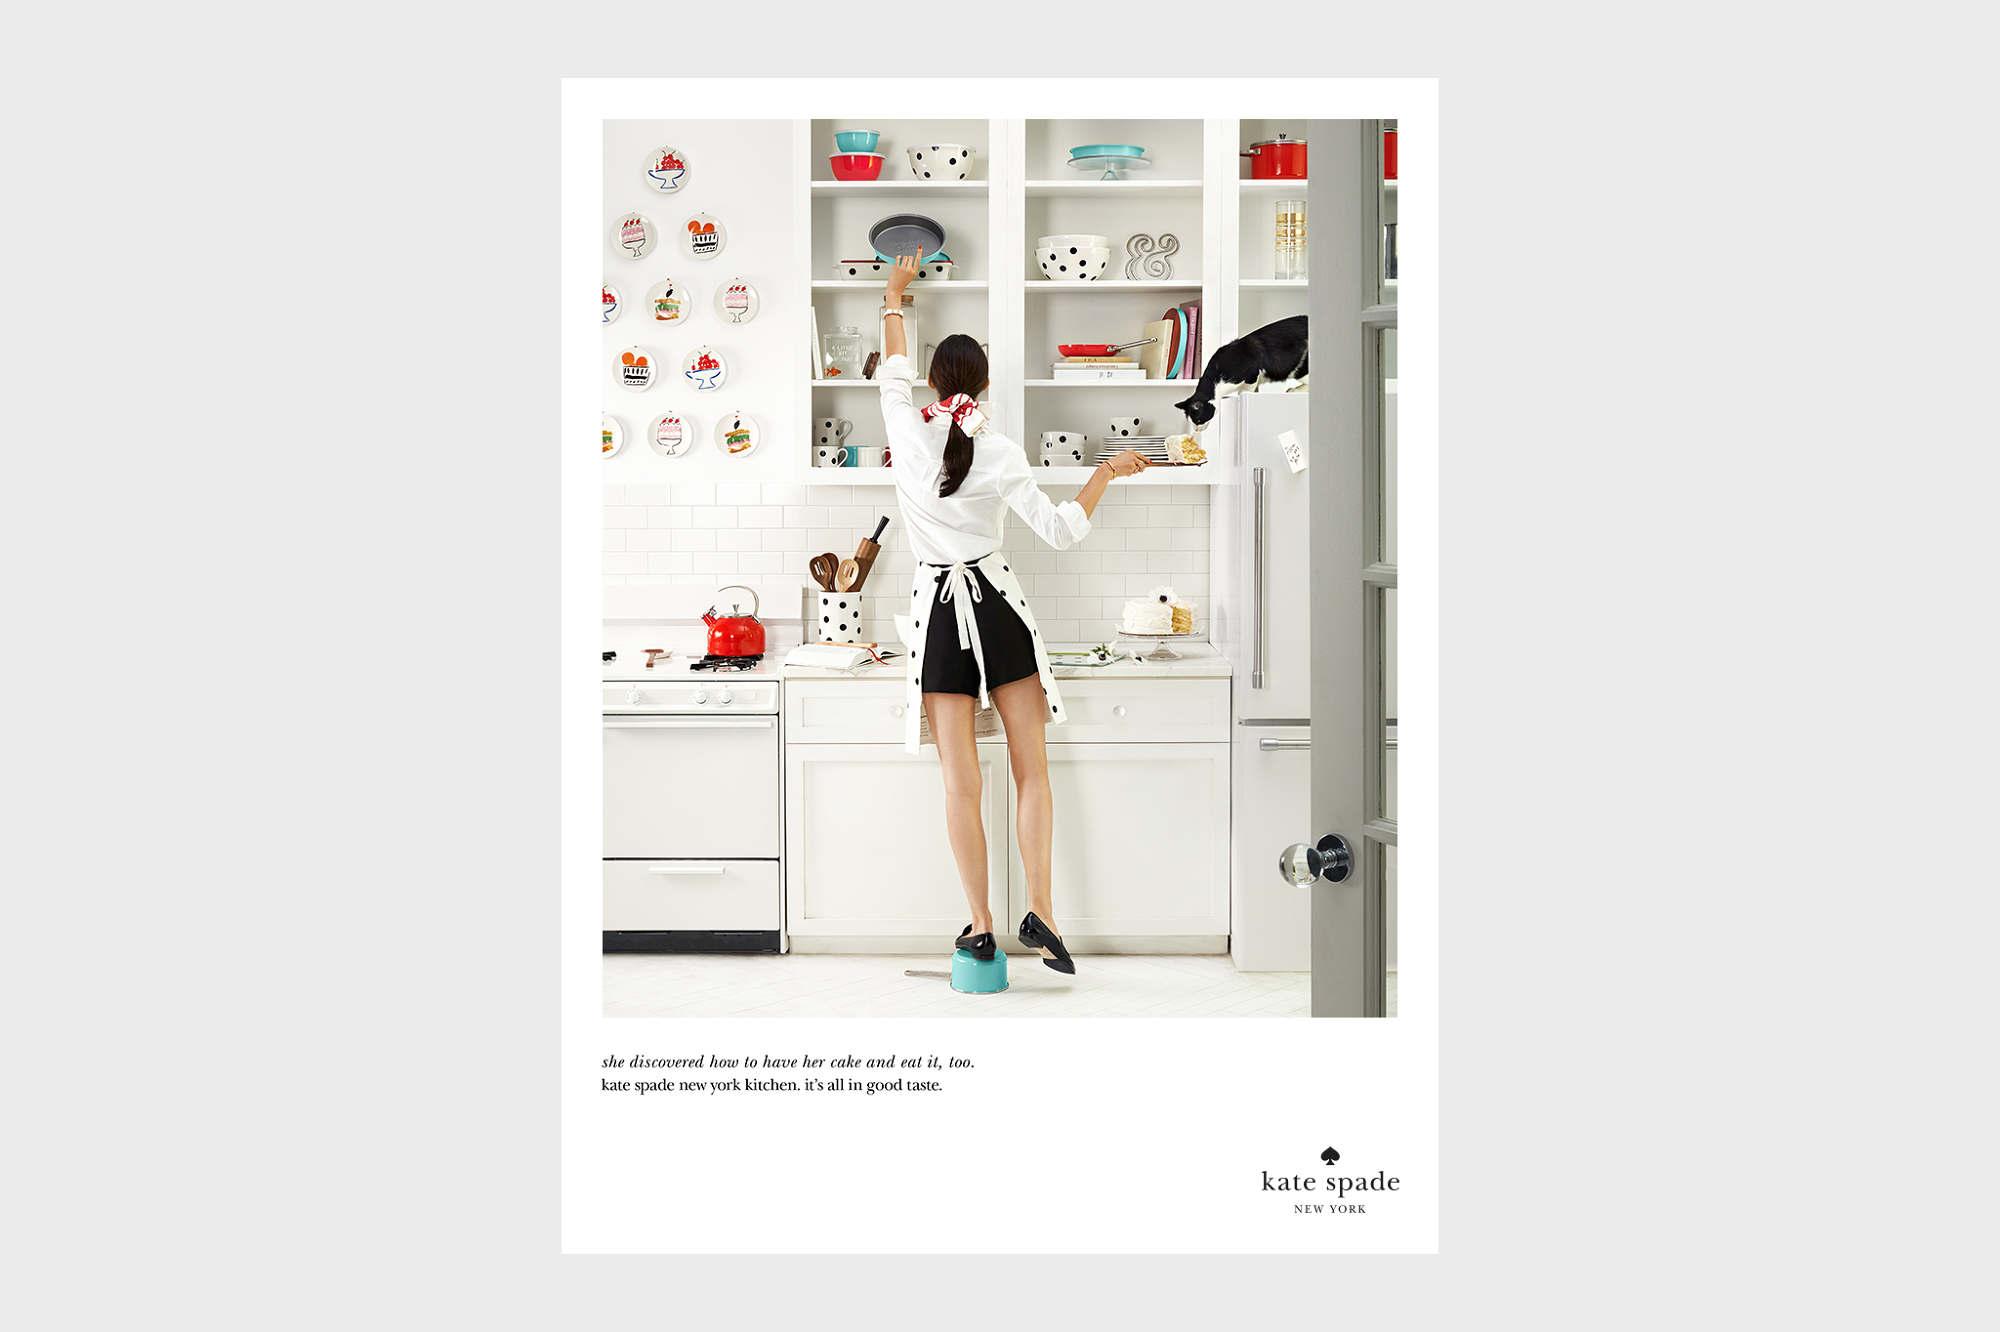 spade york ebay blend set kate oven flamingo kitchen print new animal mitts pin piece cotton potholders towel